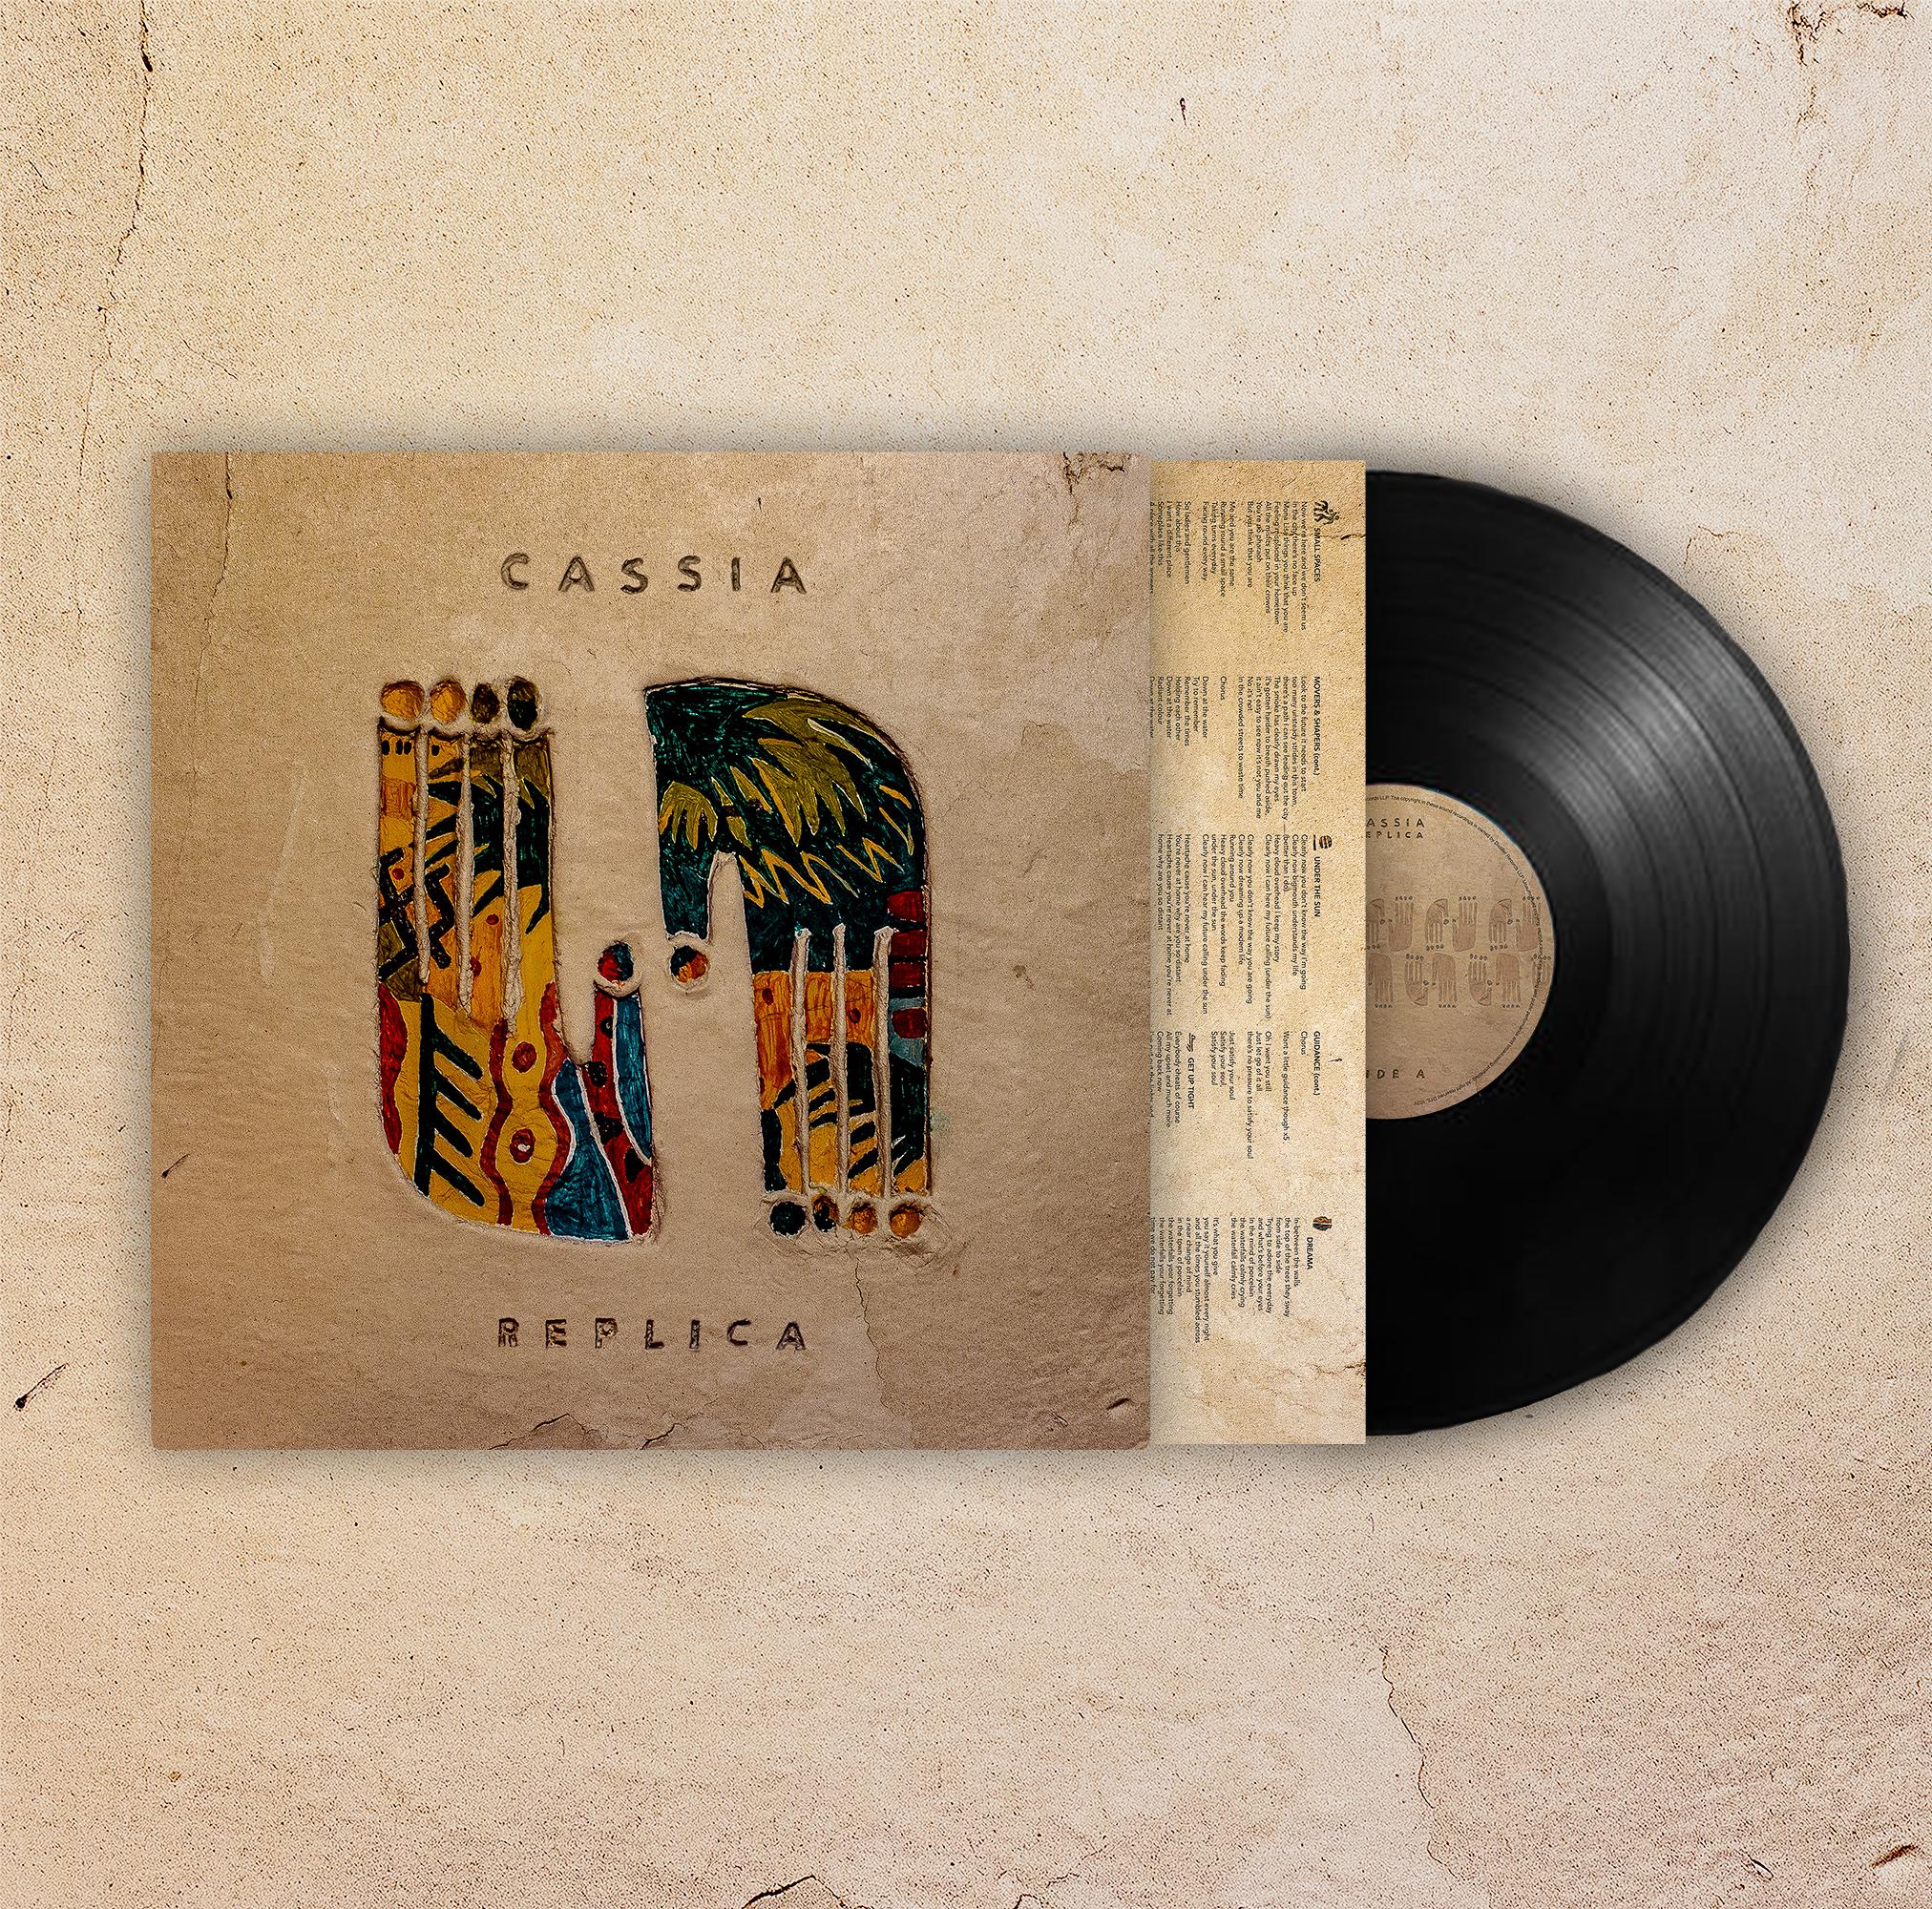 Replica - Vinyl + signed picture - Cassia